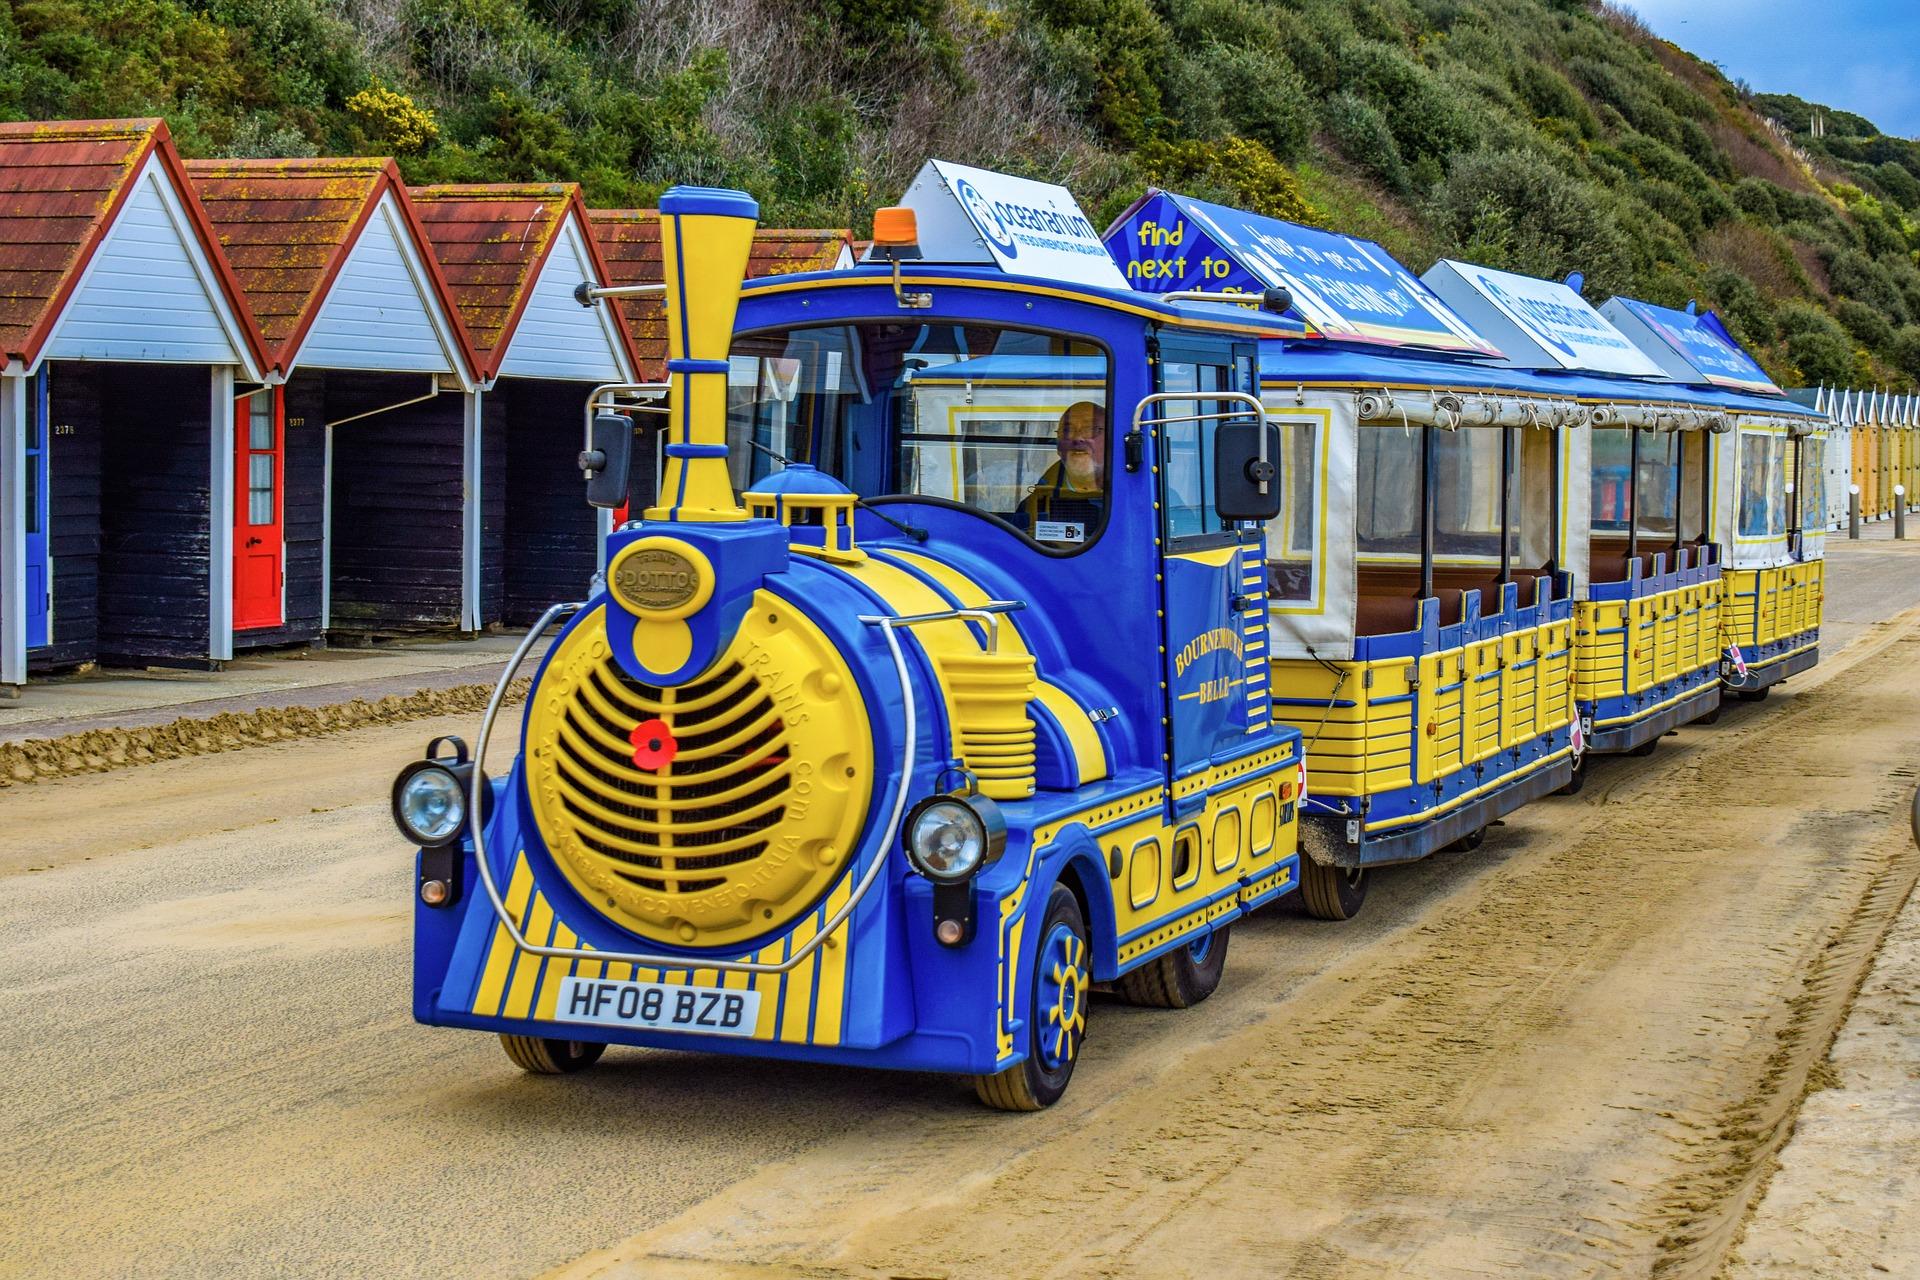 train-3956712_1920